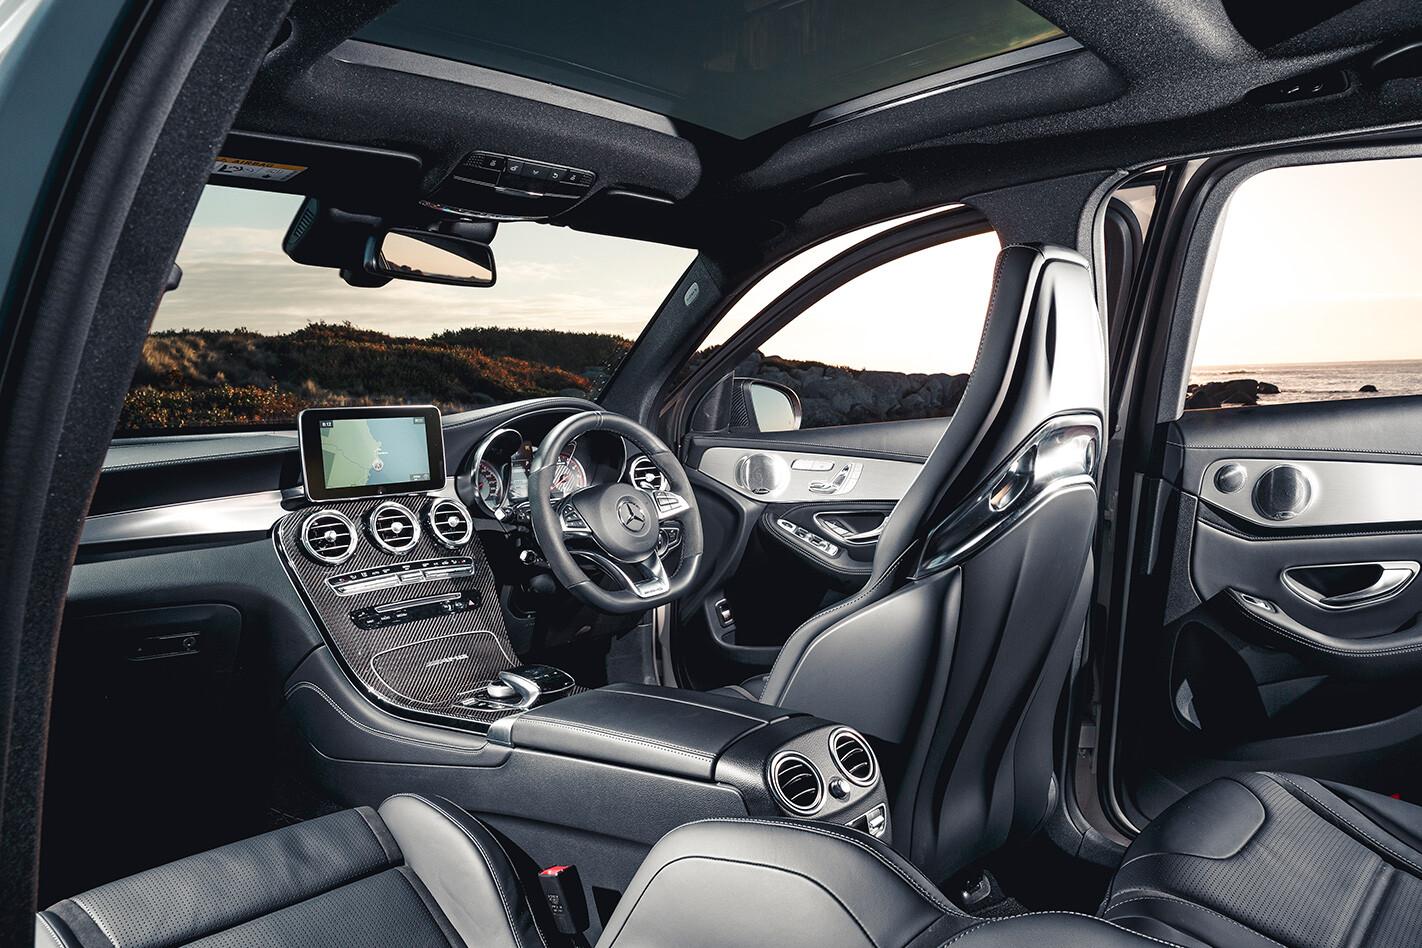 Mercedes Amg Glc Interior Jpg